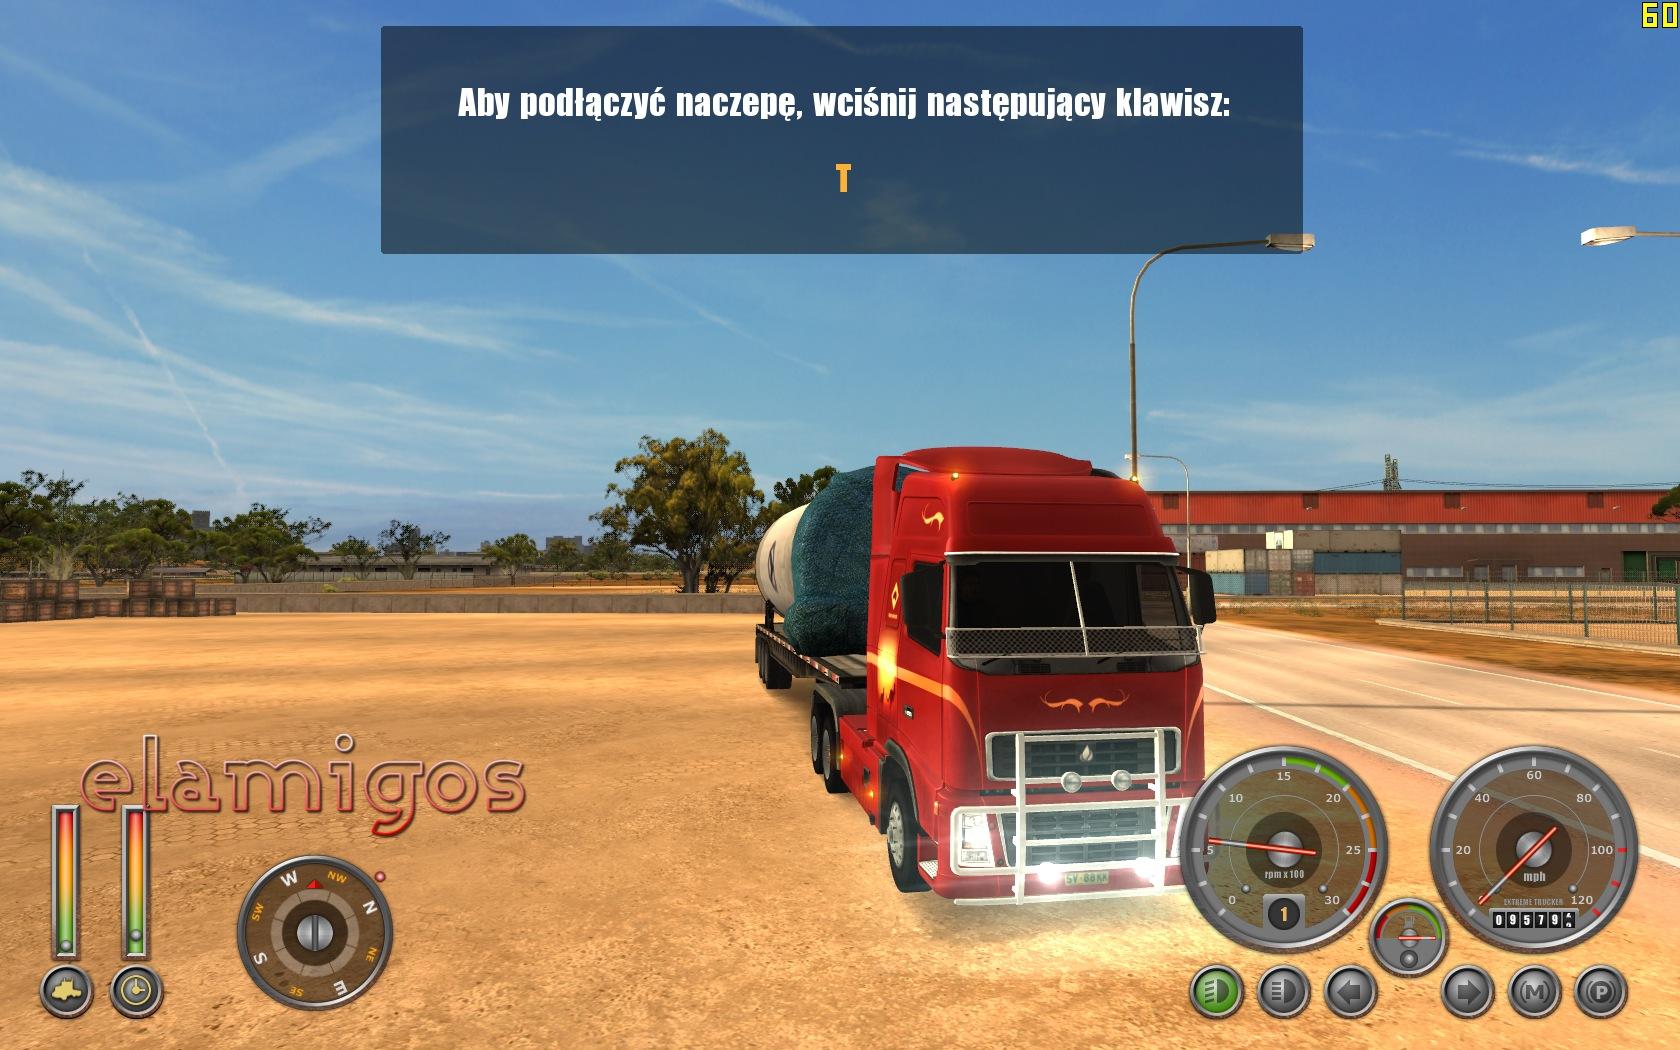 18 Wheels Of Steel: Extreme Trucker 2 (2011) PL.MULTi9.ISO-ELAMIGOS